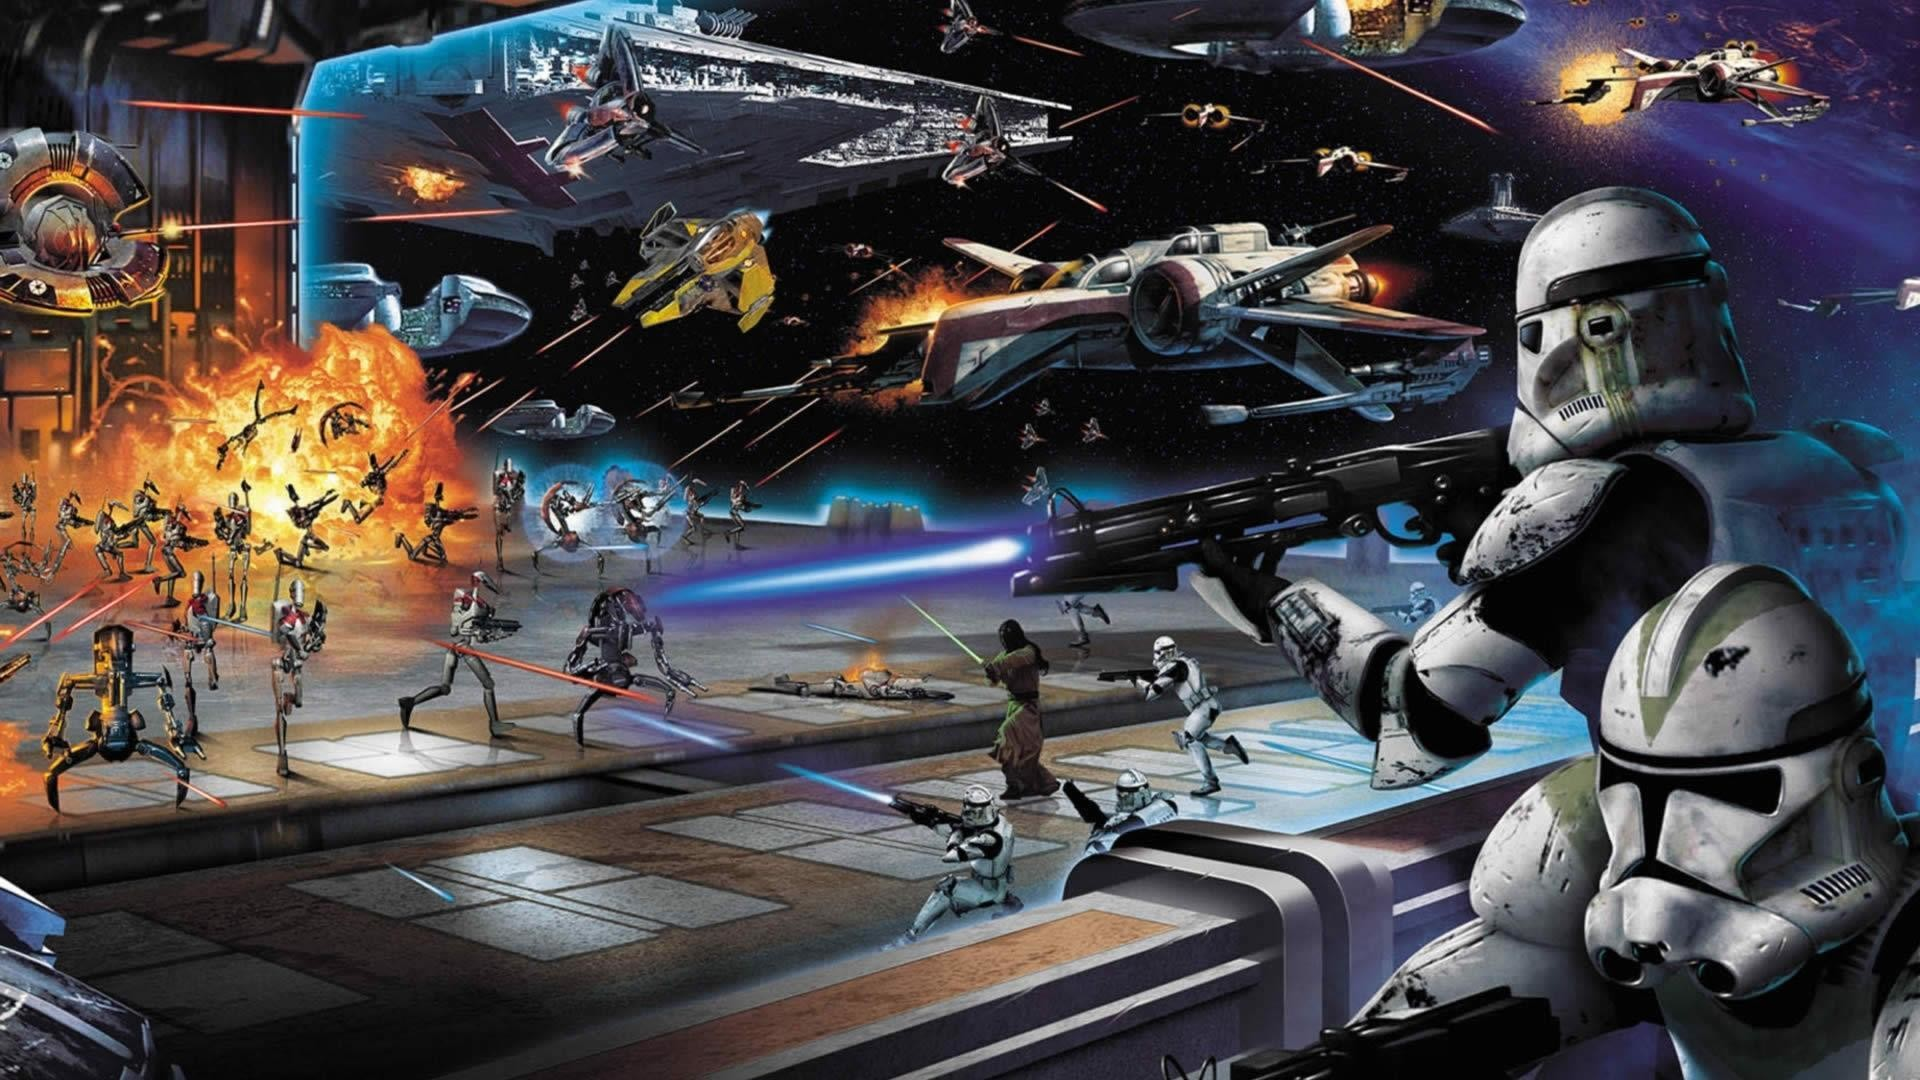 … epic star wars wallpaper …